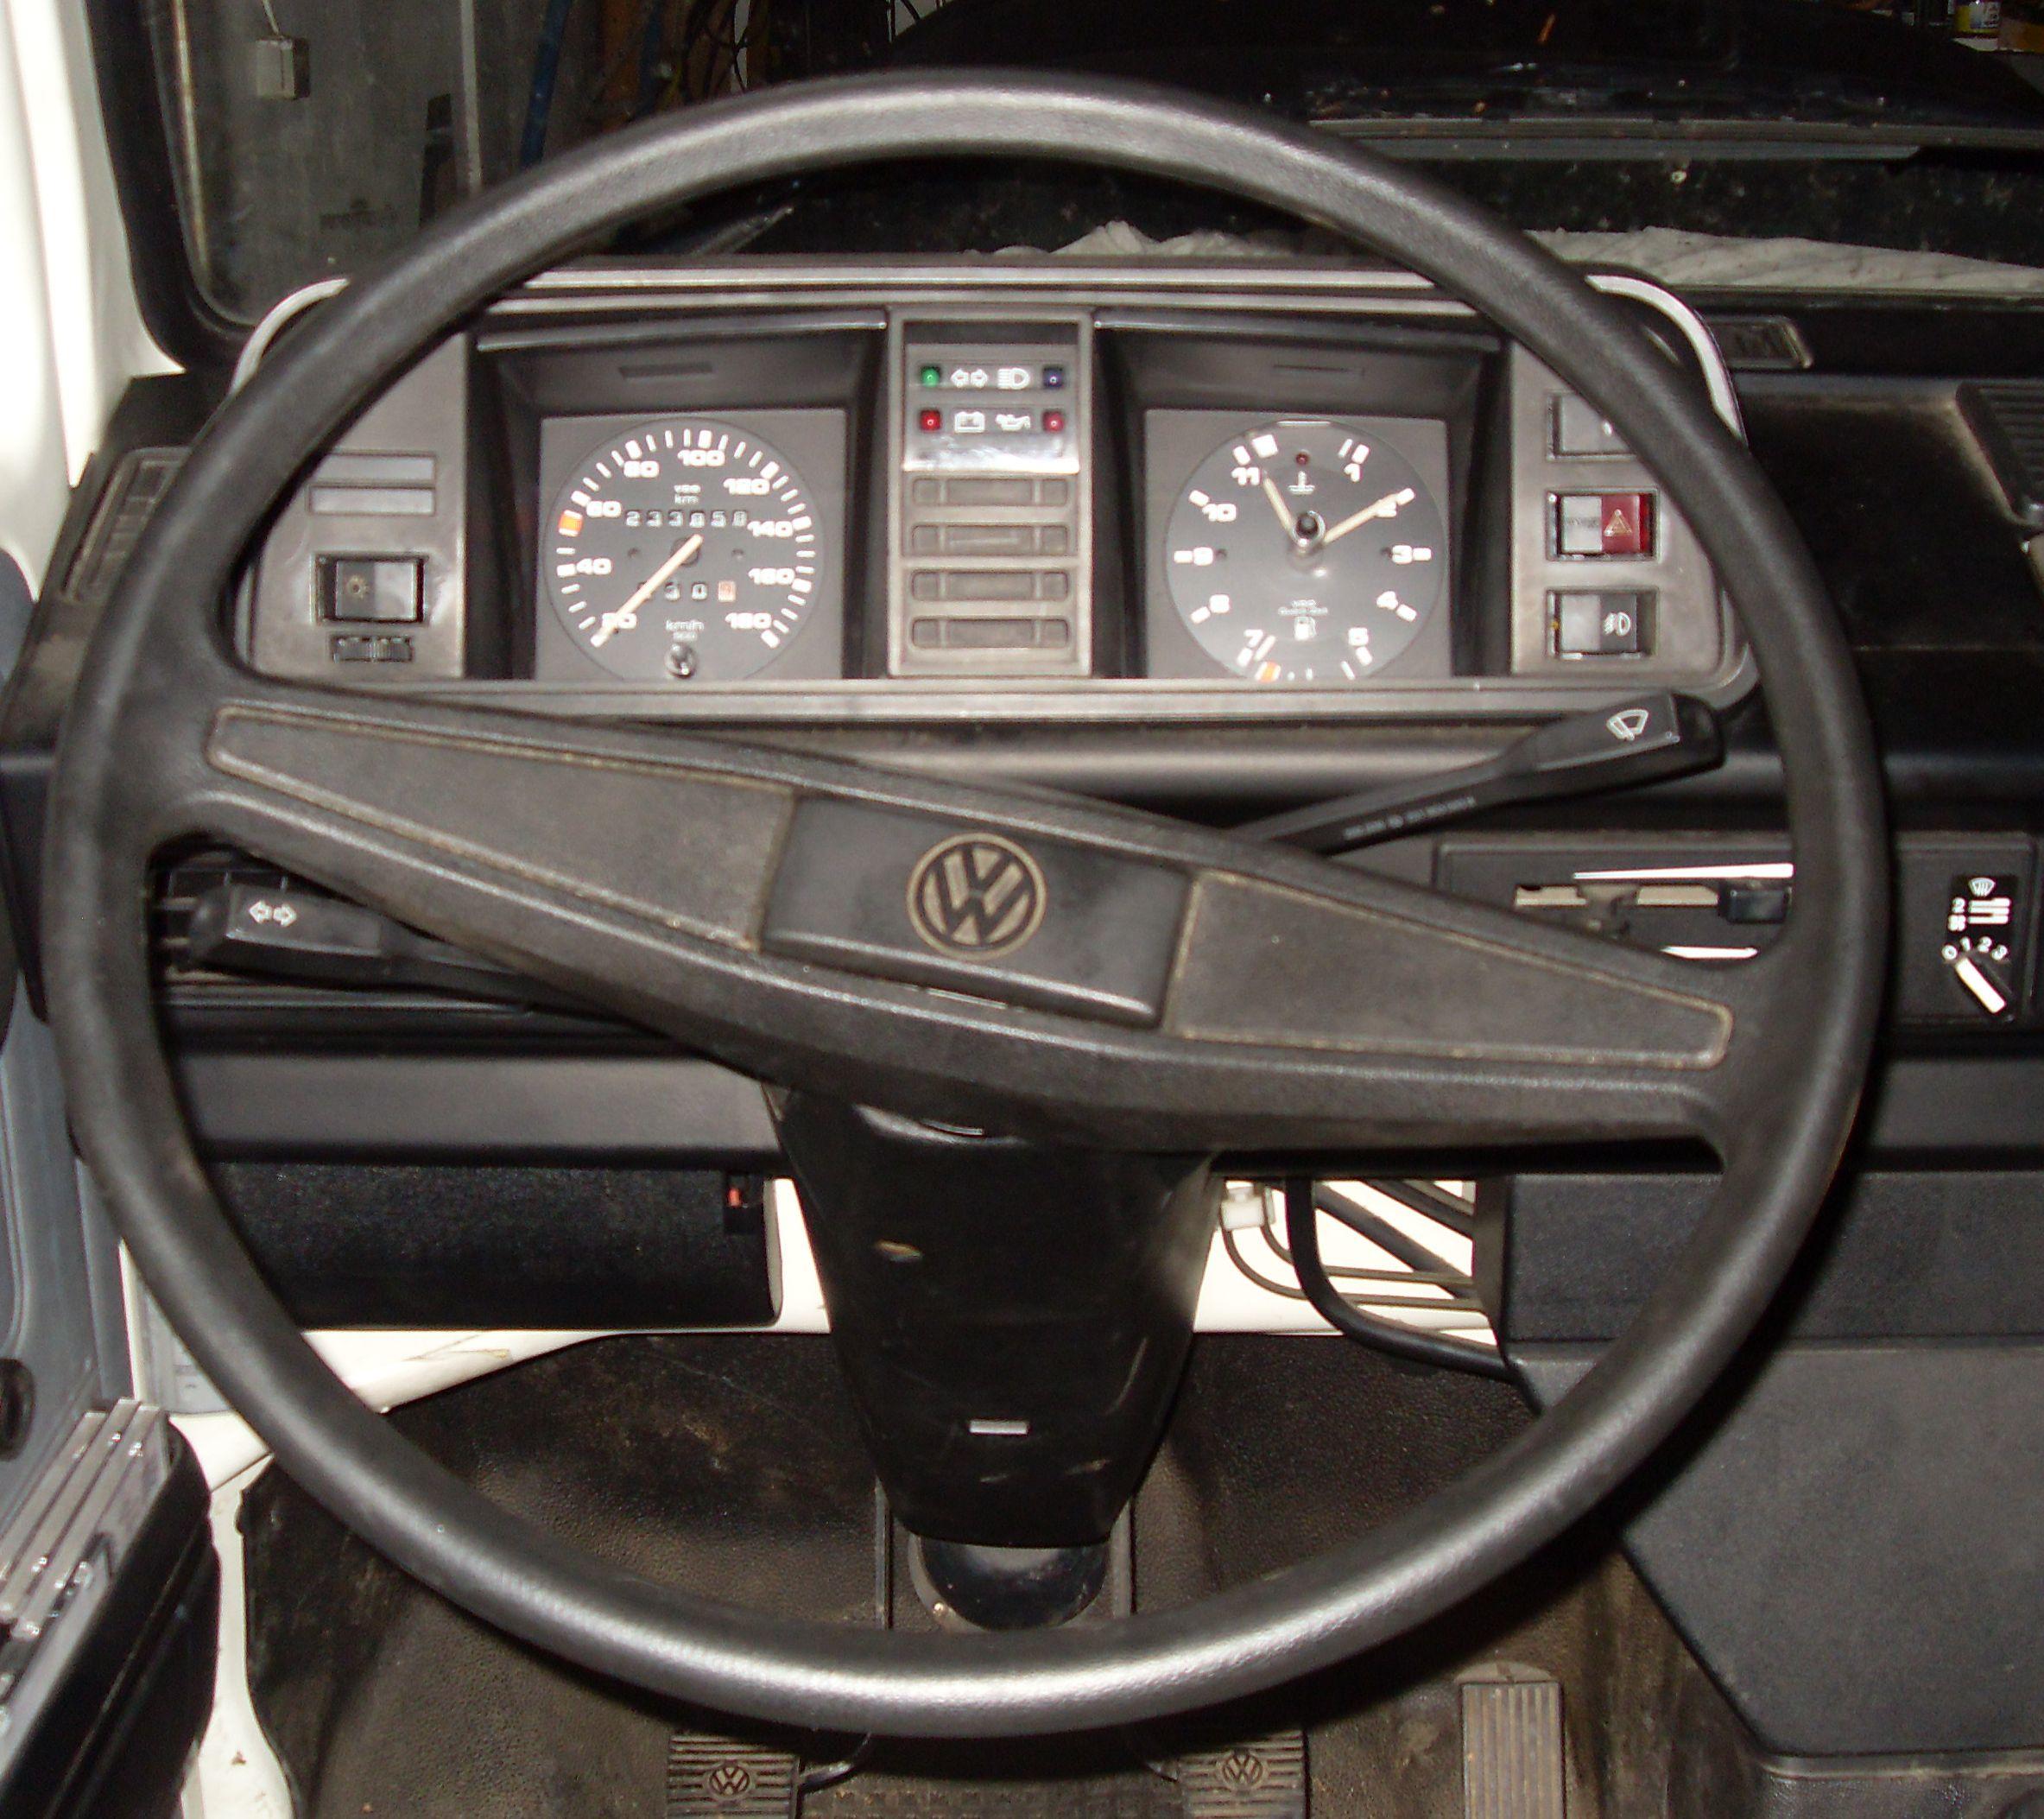 File:T3 1989 Cockpit.jpg - Wikimedia Commons | {Auto cockpit vw 19}